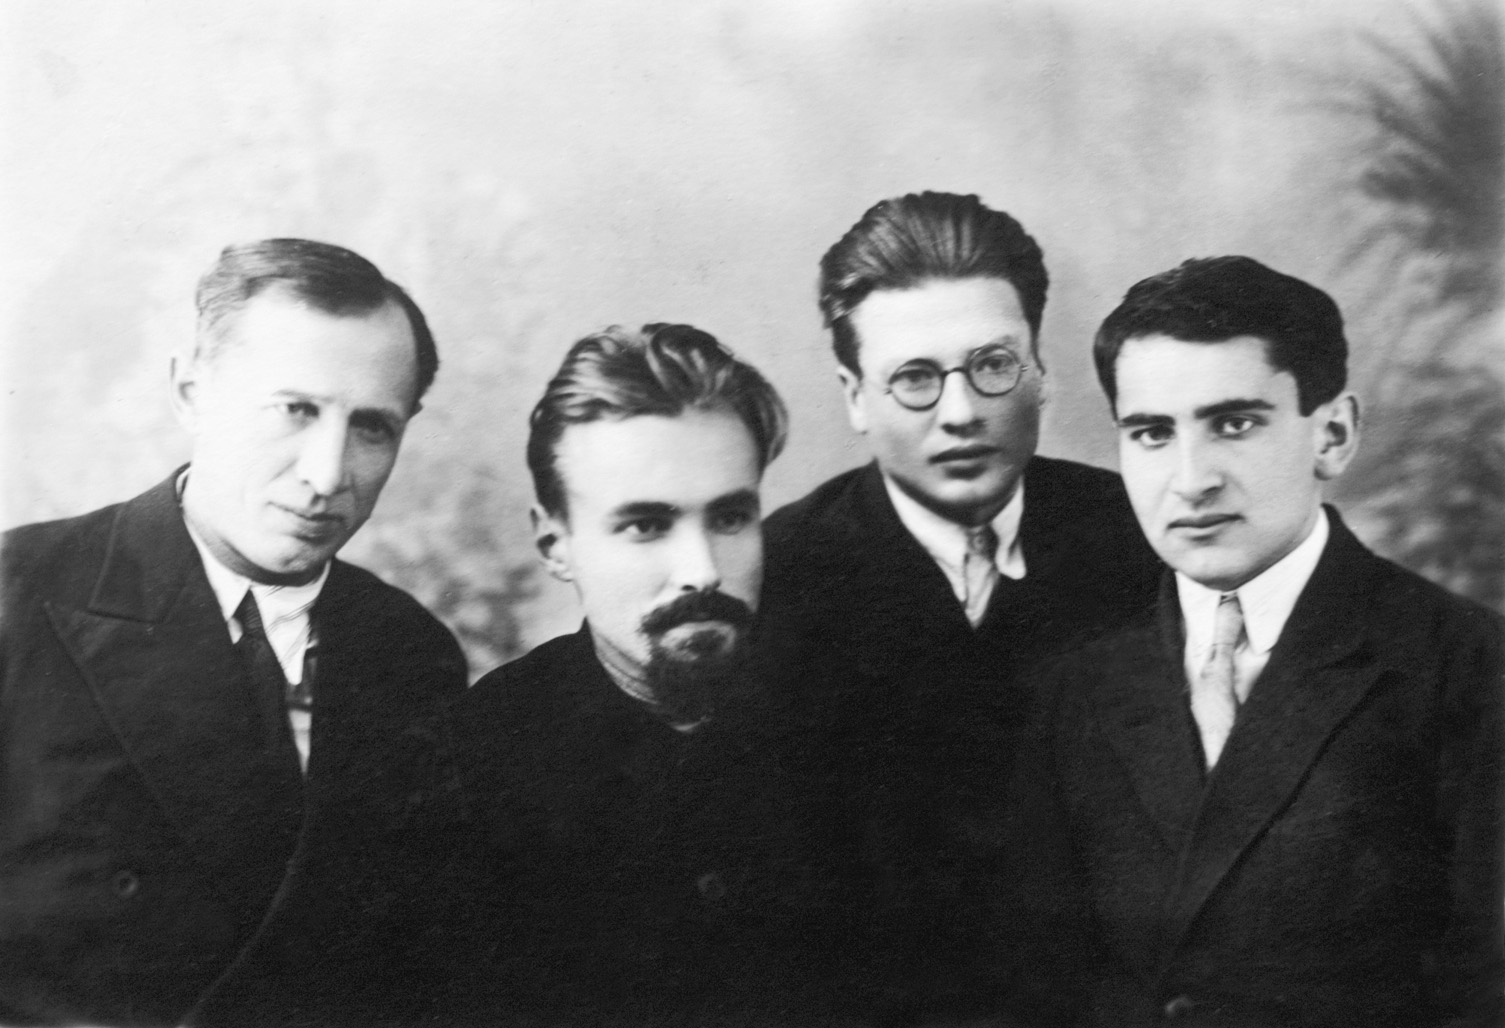 Н.Г. Чеботарев и его ученики: В.В. Морозов, И.Д. Адо,Н.Н. Мейман